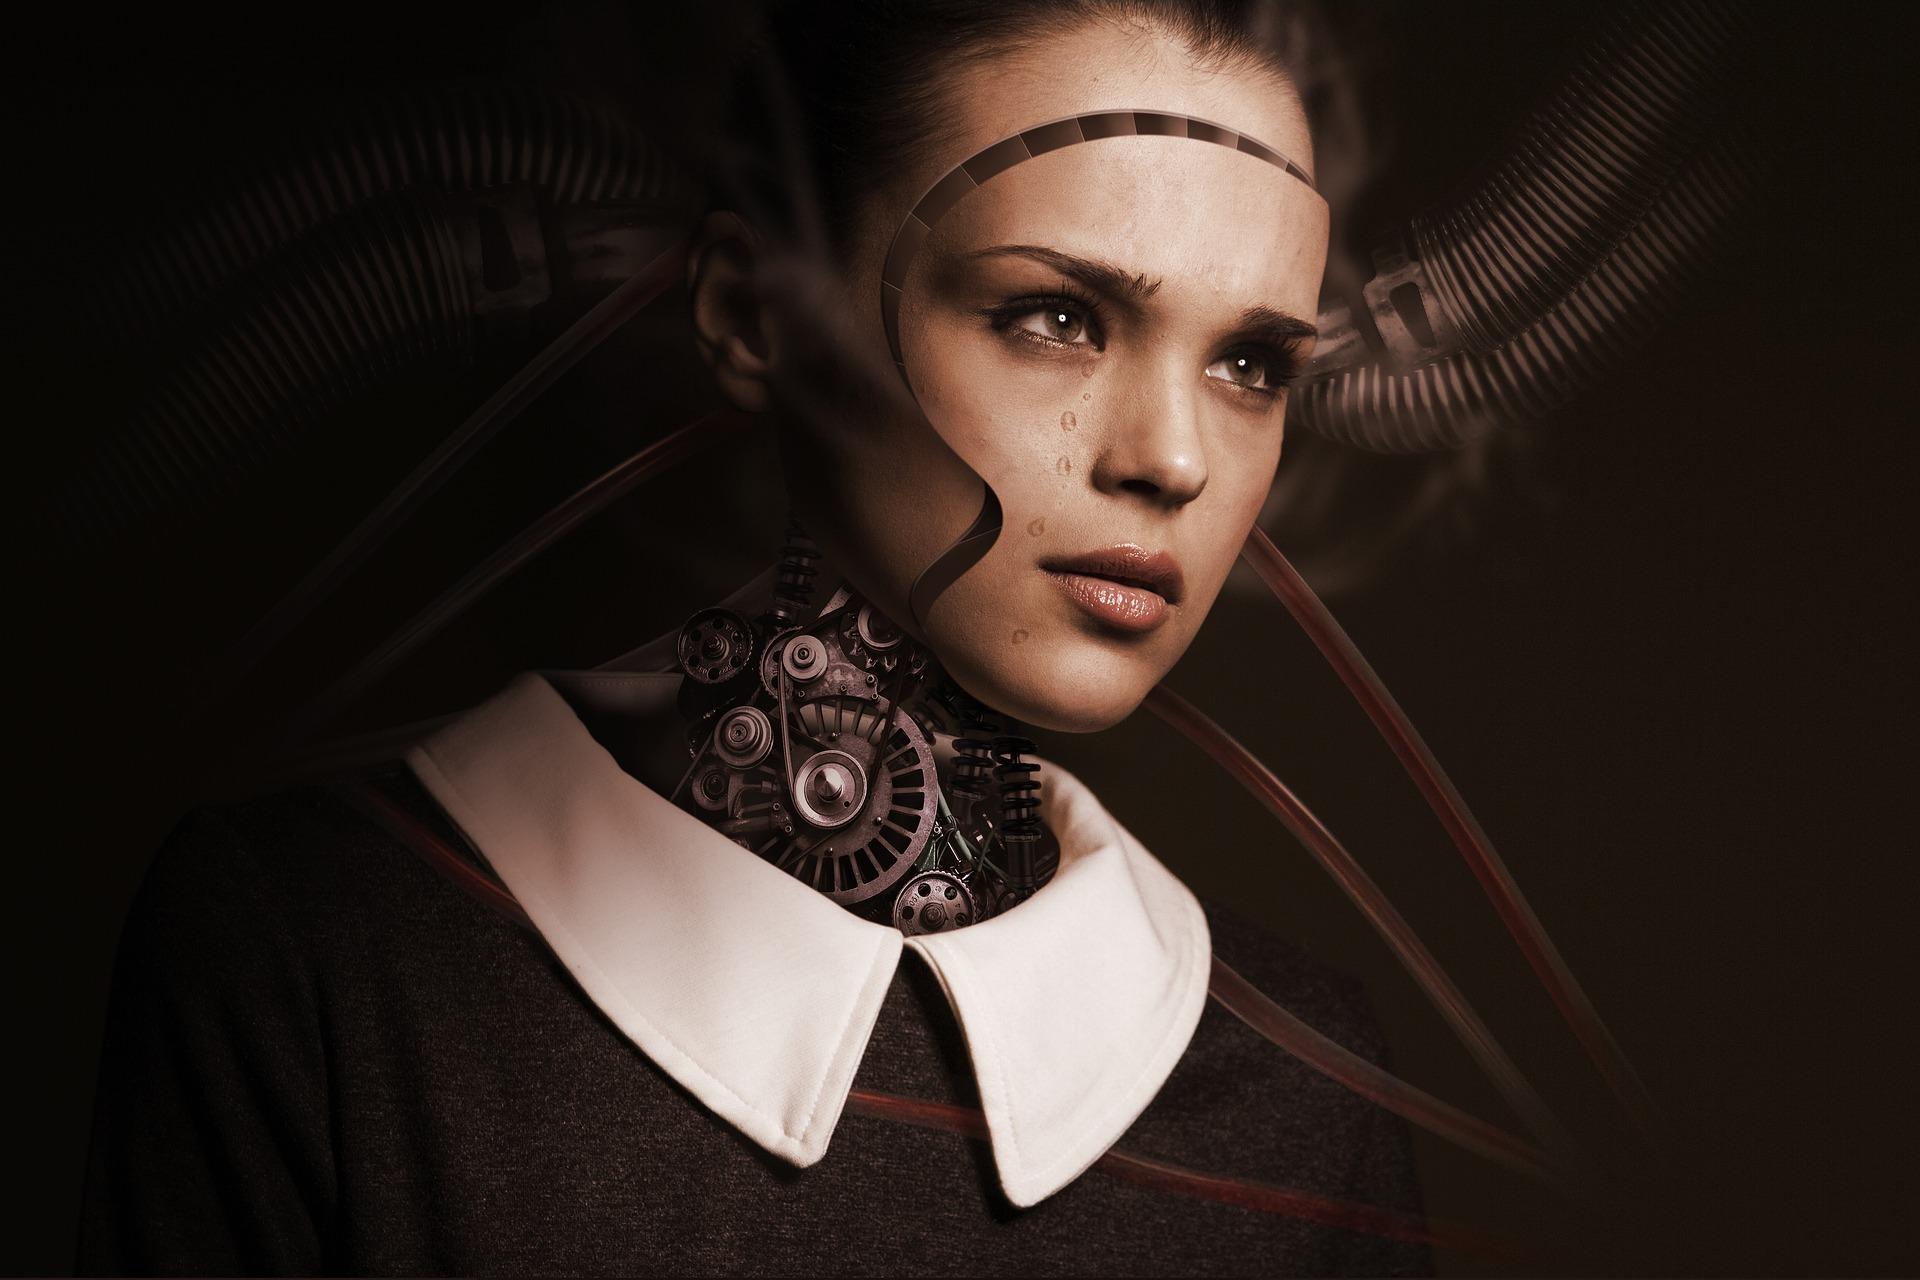 #1 SI Kobieta - Sztuczna, inteligencja, robot, kobieta, świadomość